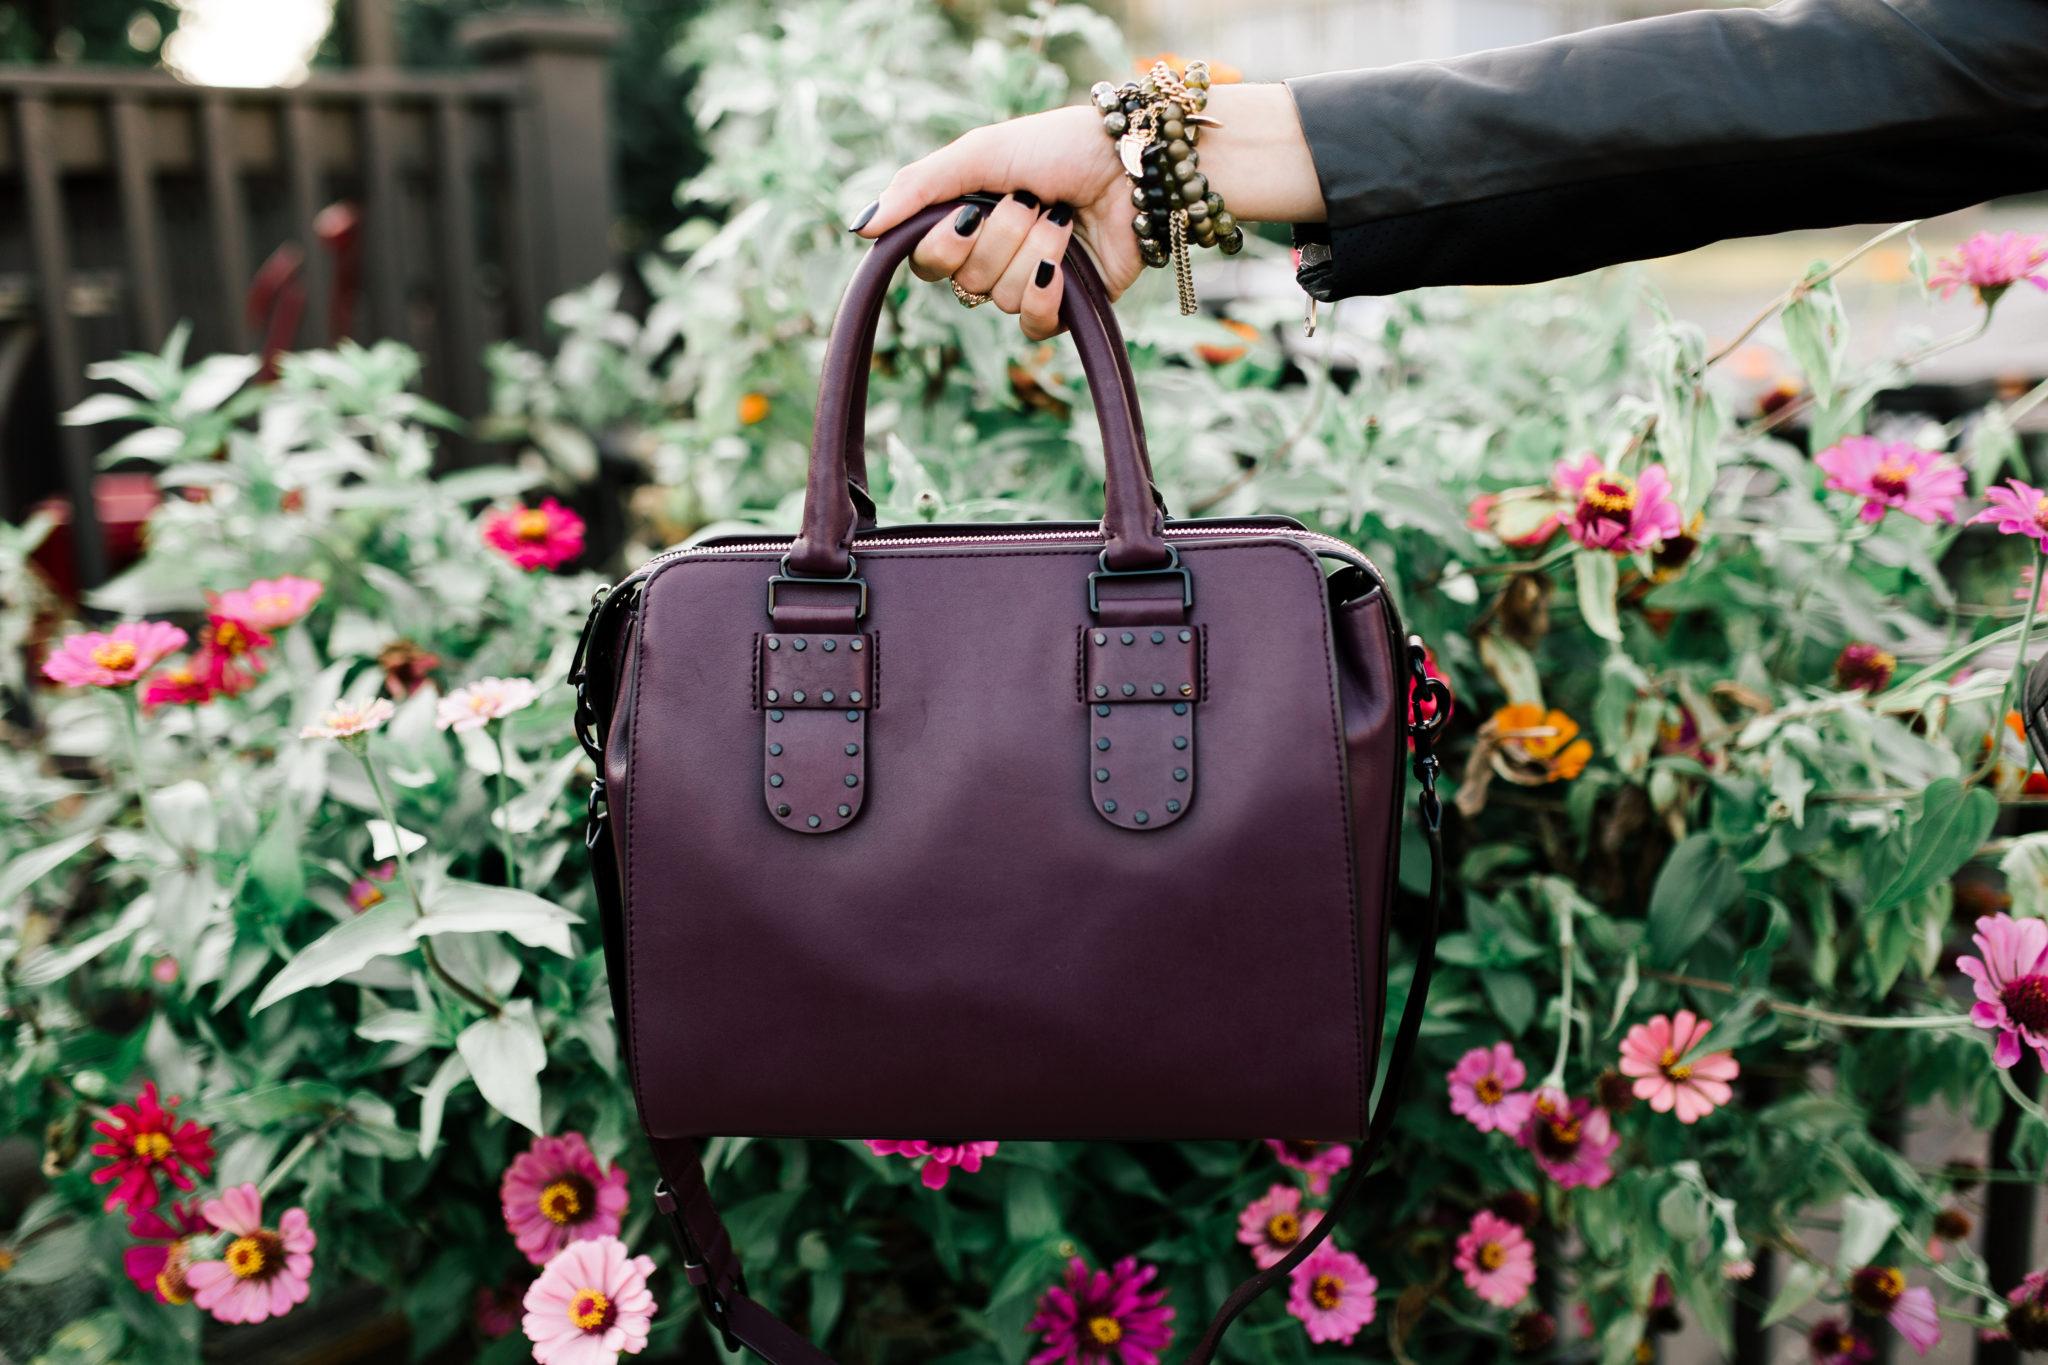 Rebecca Minkoff Fall Bags